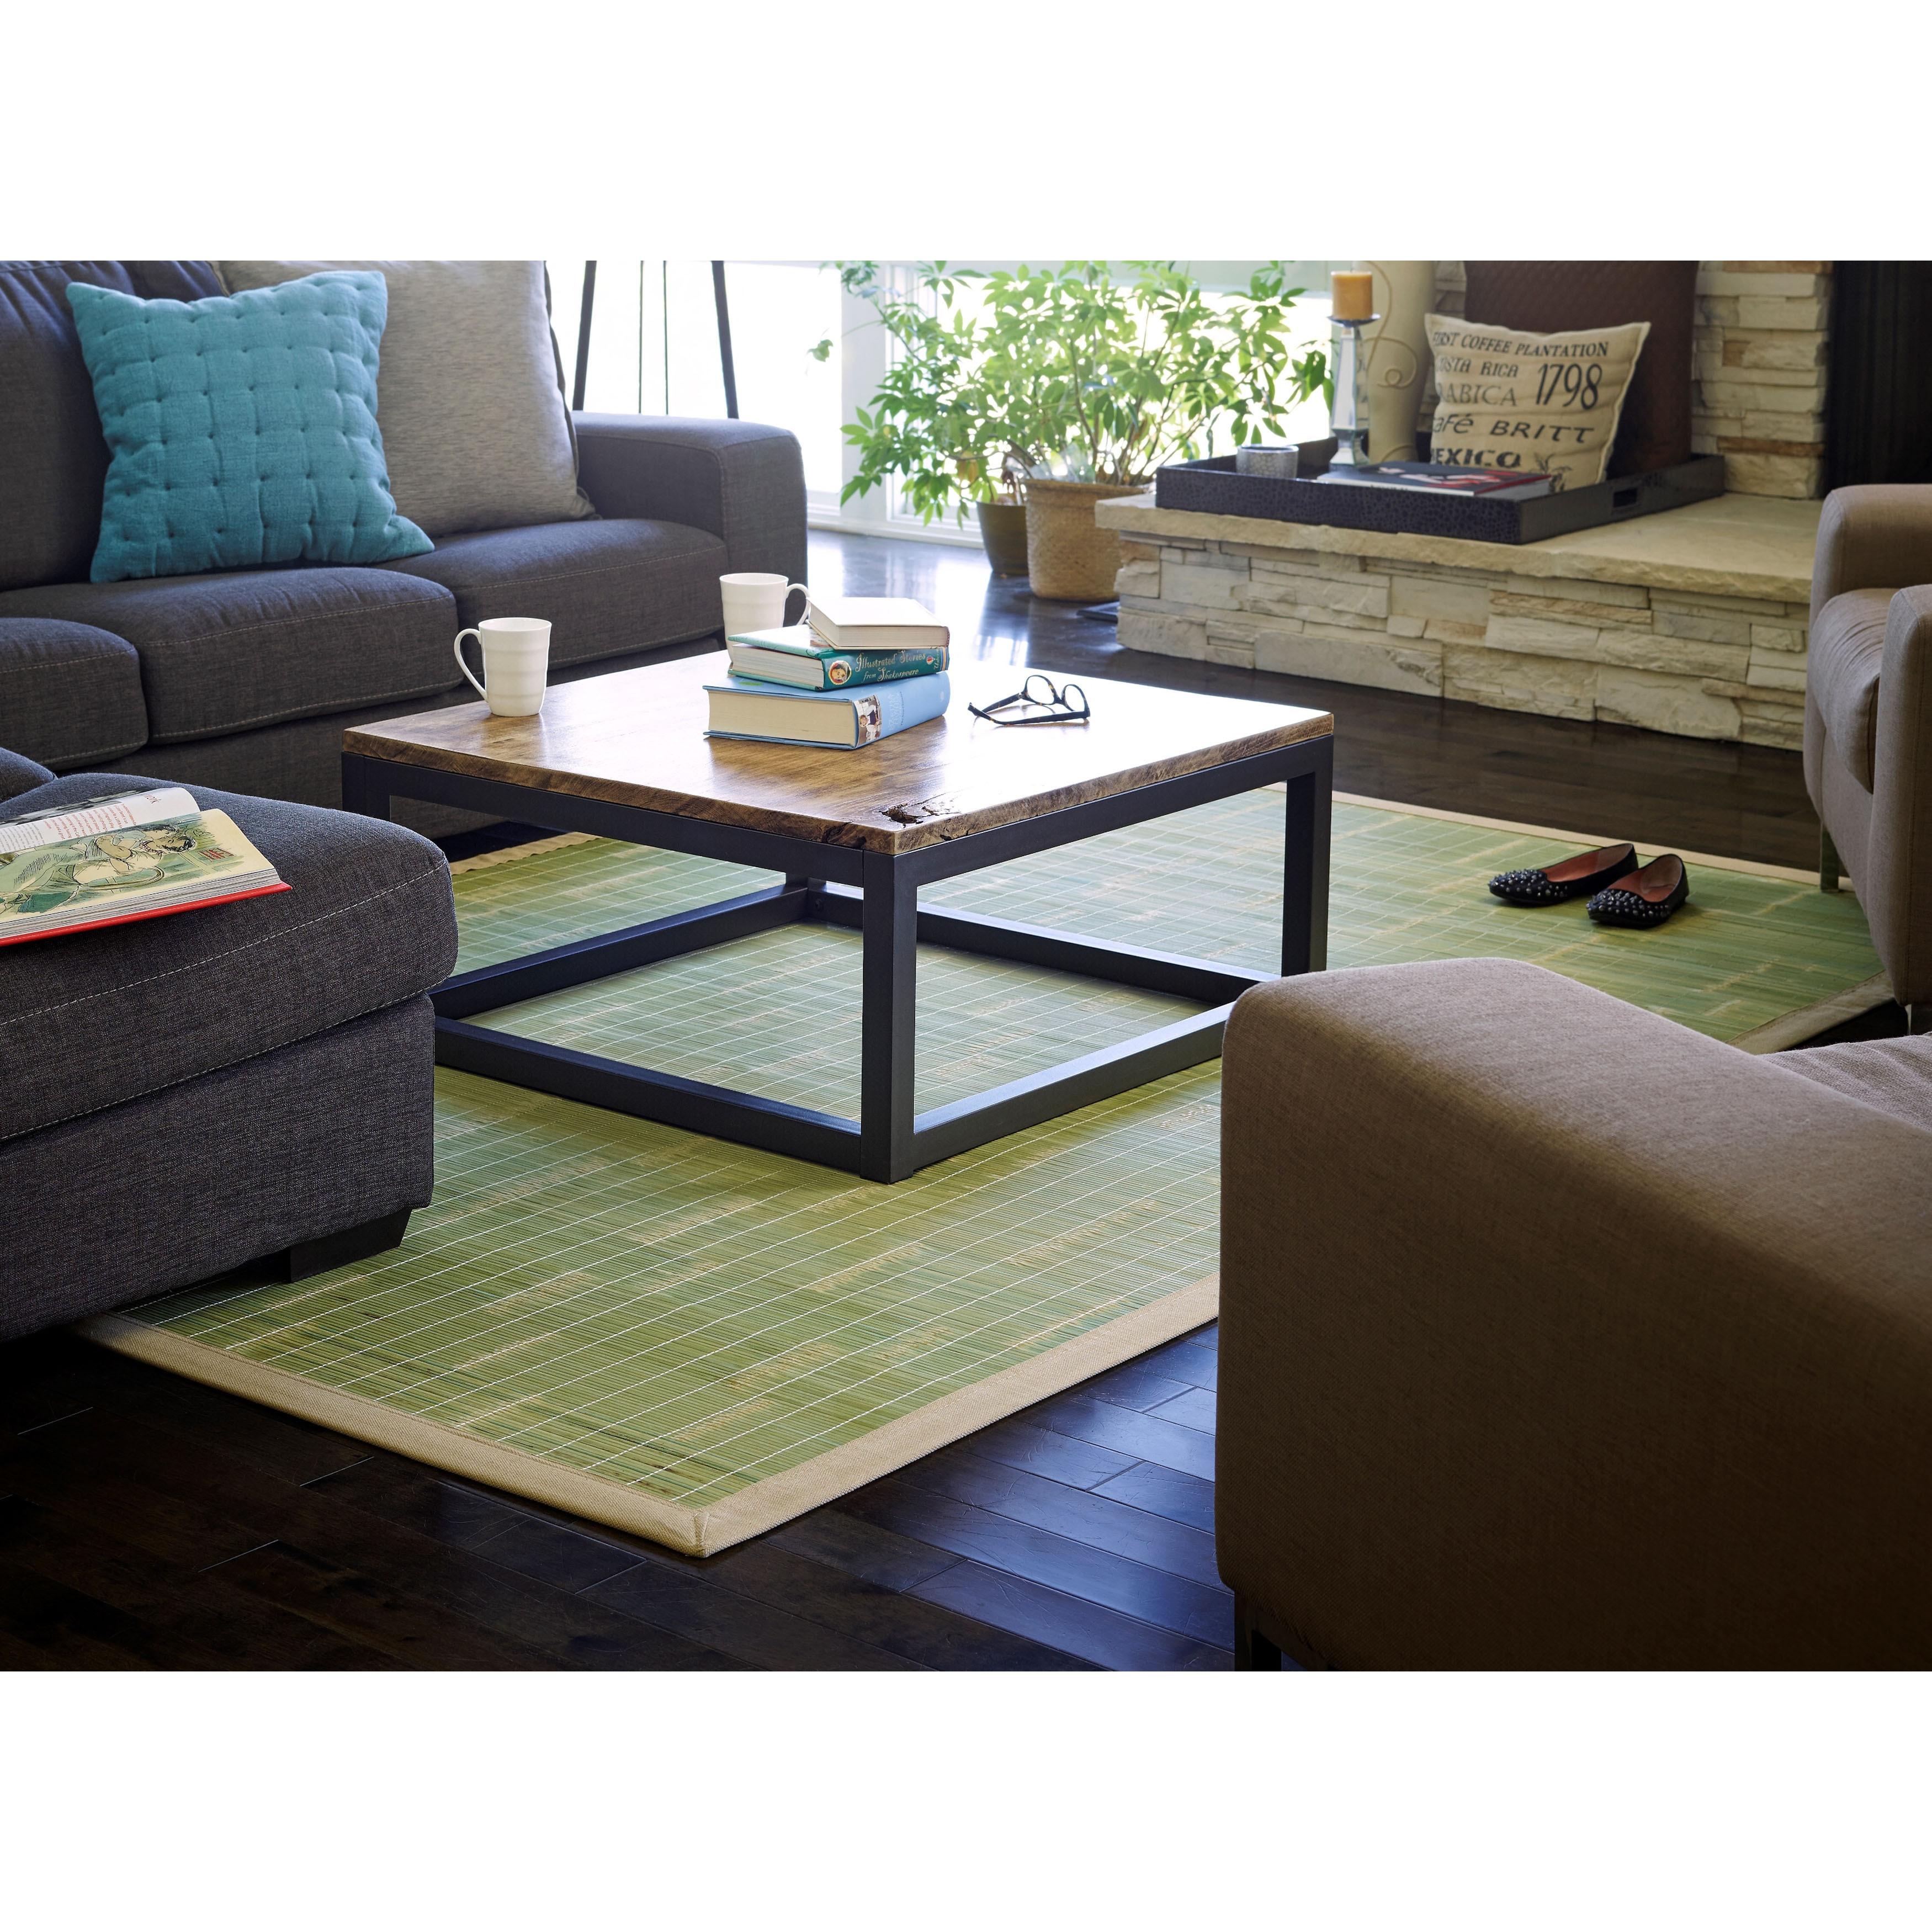 Shop Jani Citroen Green Bamboo Rug with Tan Border Free Shipping